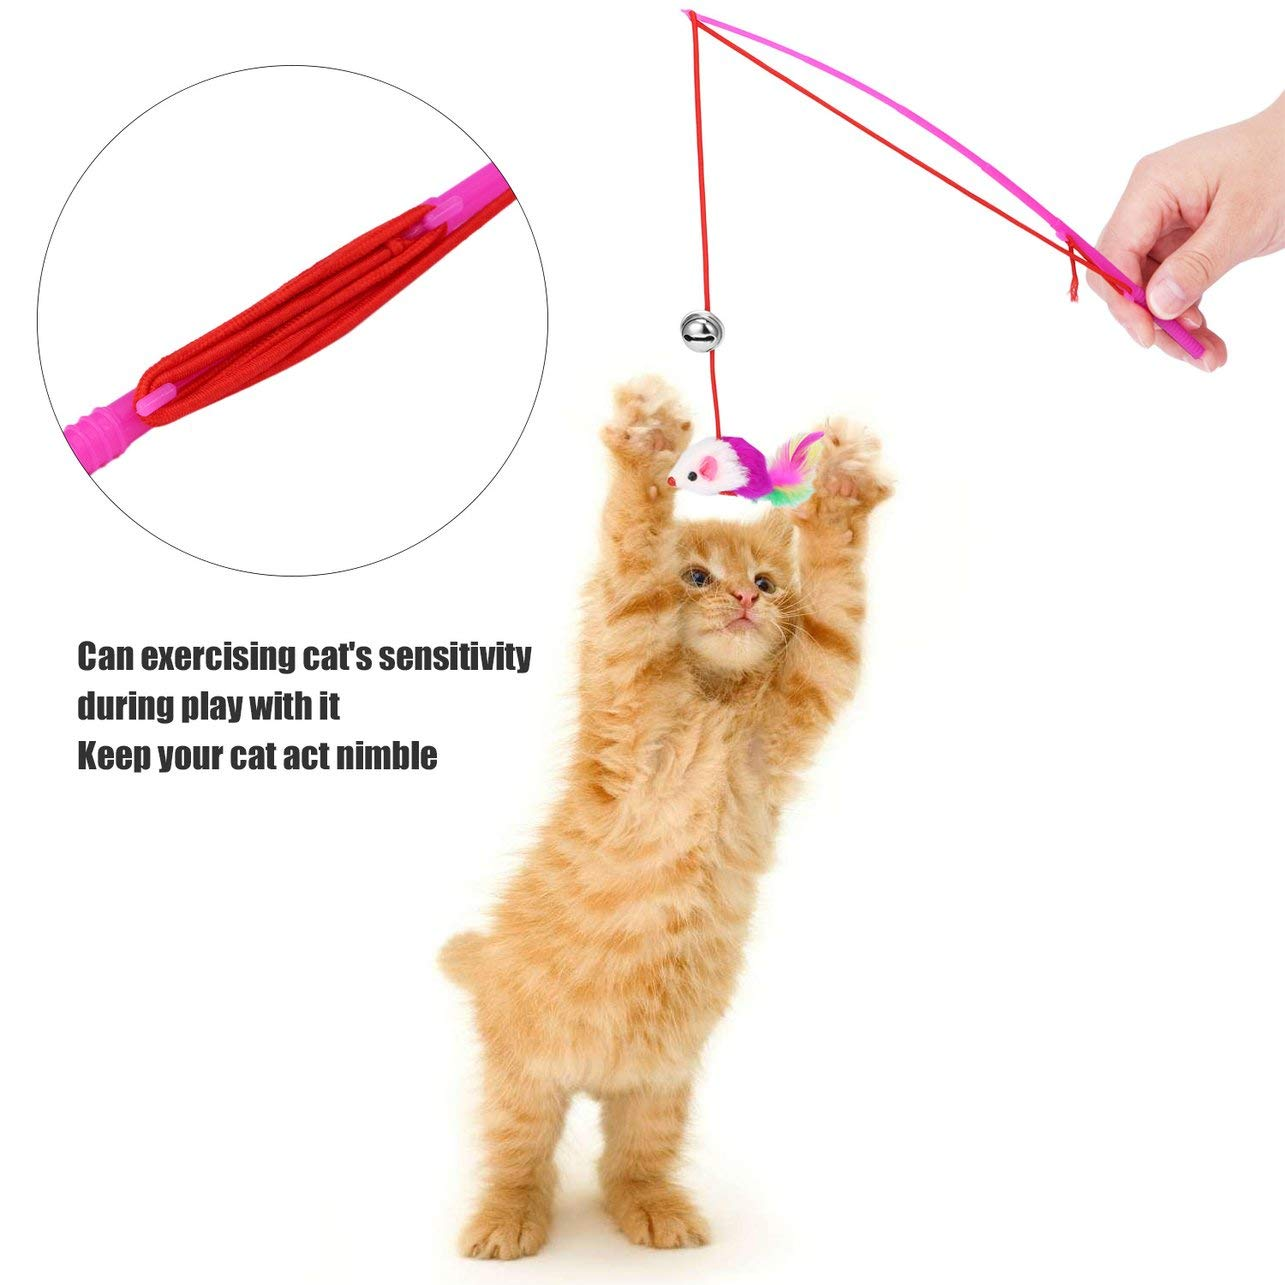 Heaviesk Feather Toy Wand Teaser Wand Cat Toys Barra de Varita retr/áctil interactiva con una Variedad de Juguetes de Plumas para ejercitar Gatito o Gato